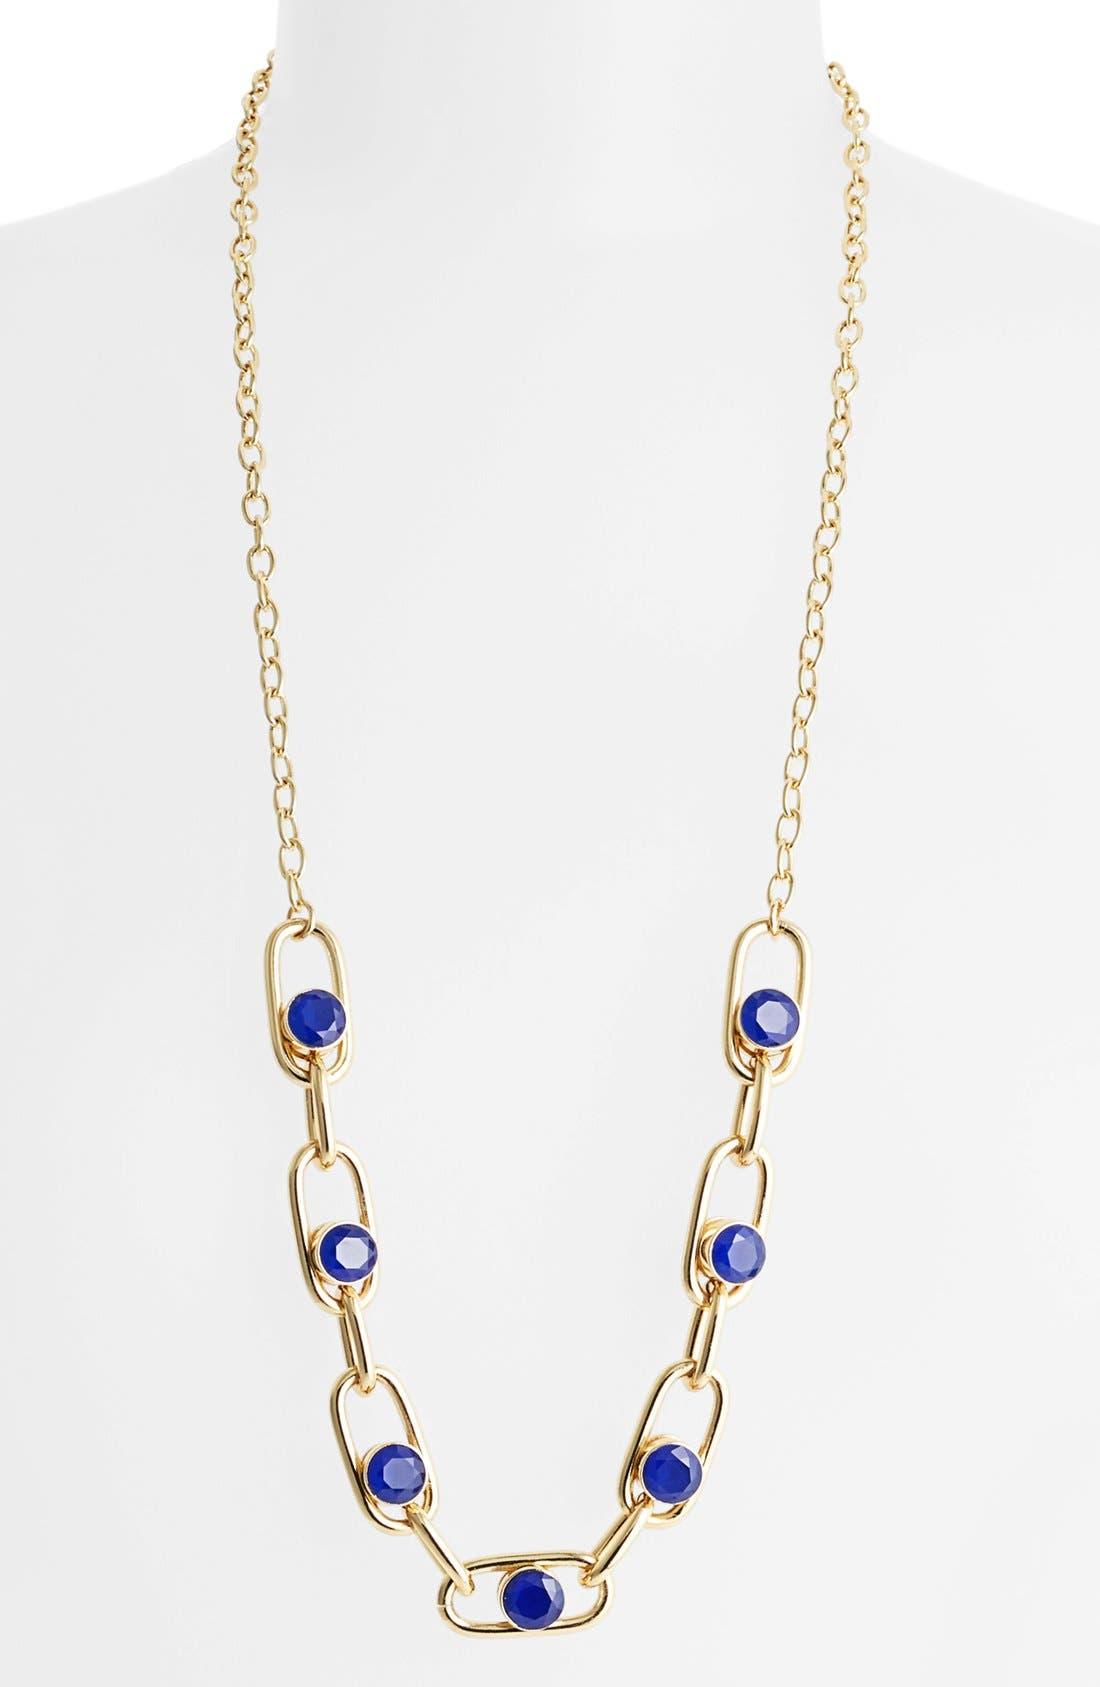 Alternate Image 1 Selected - kate spade new york 'get rolling' long link necklace